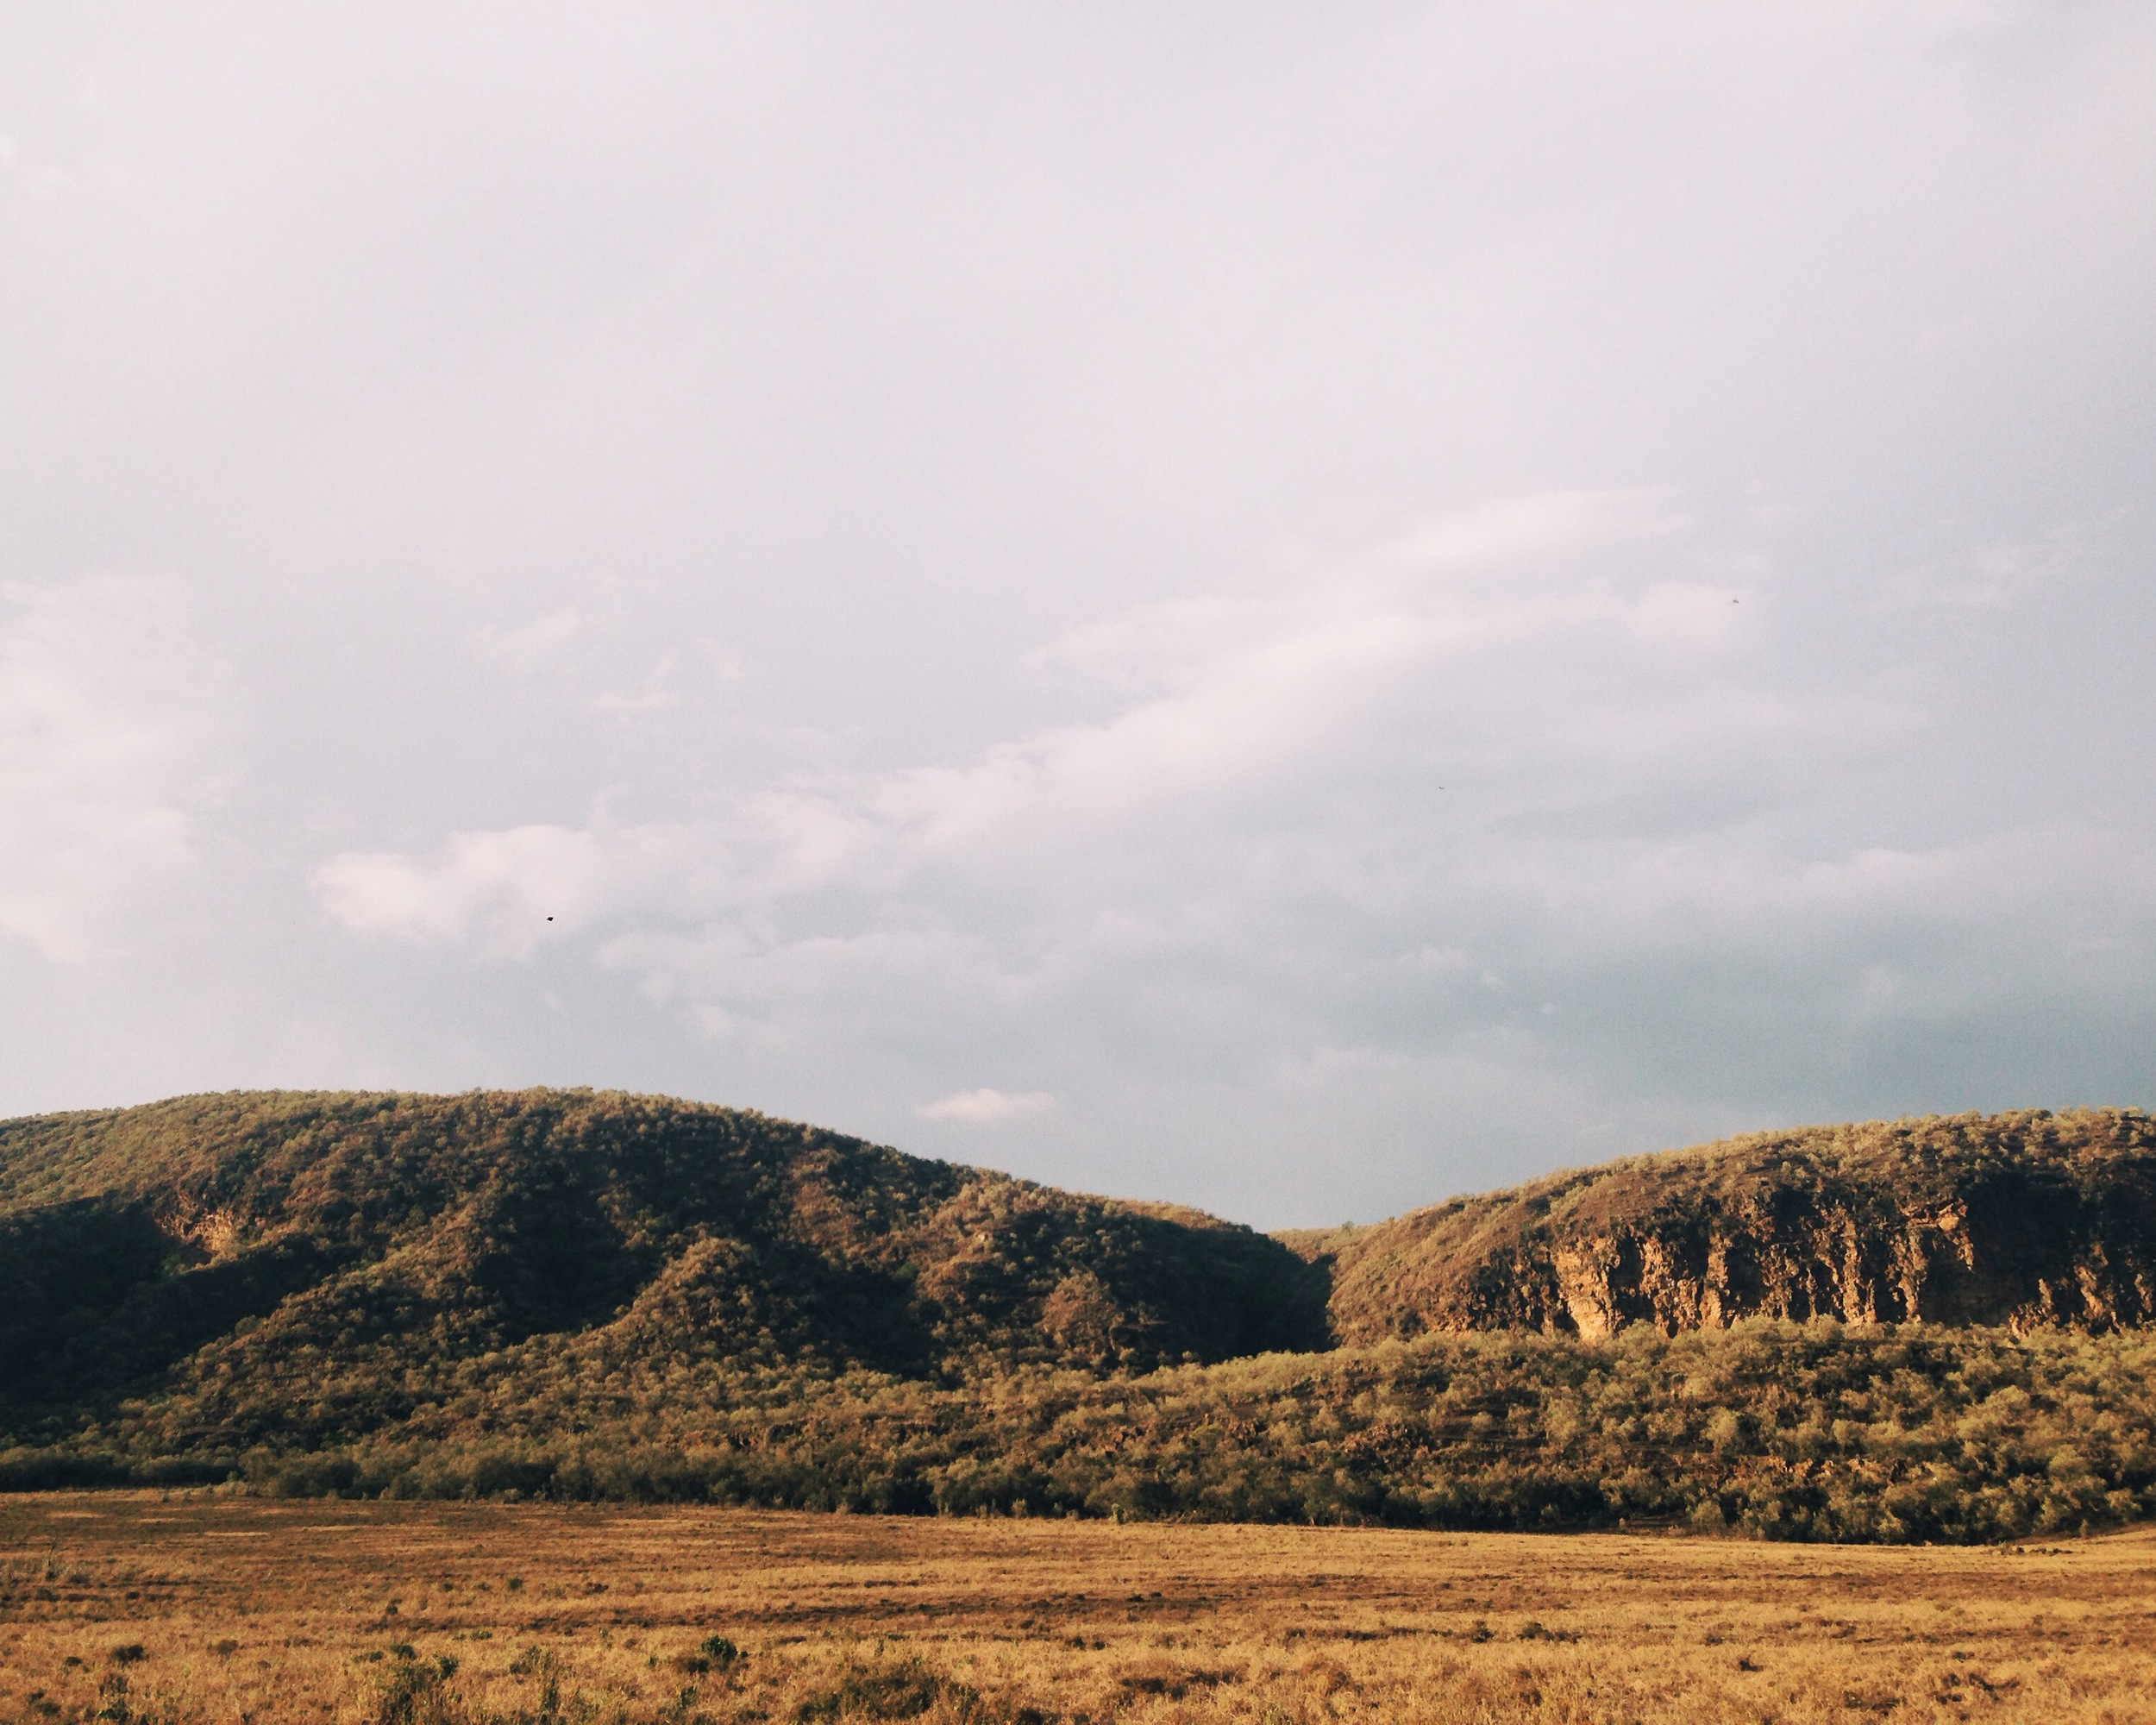 Hell's Gate National Park in Kenya